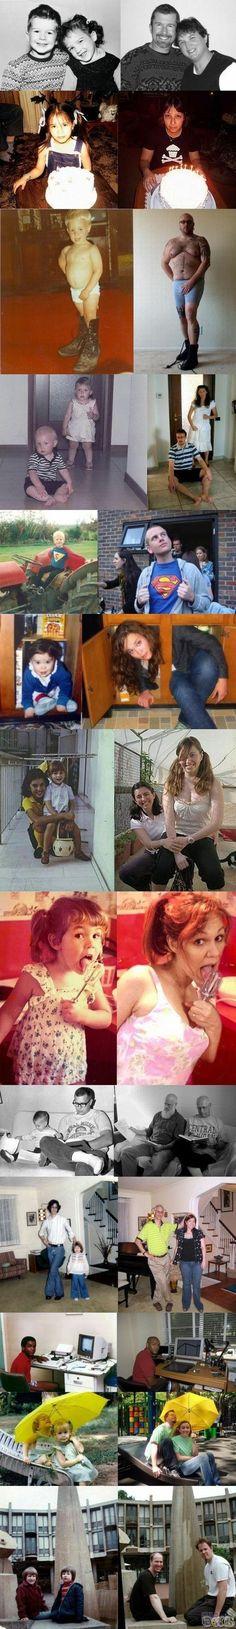 Recreating #childhood photos